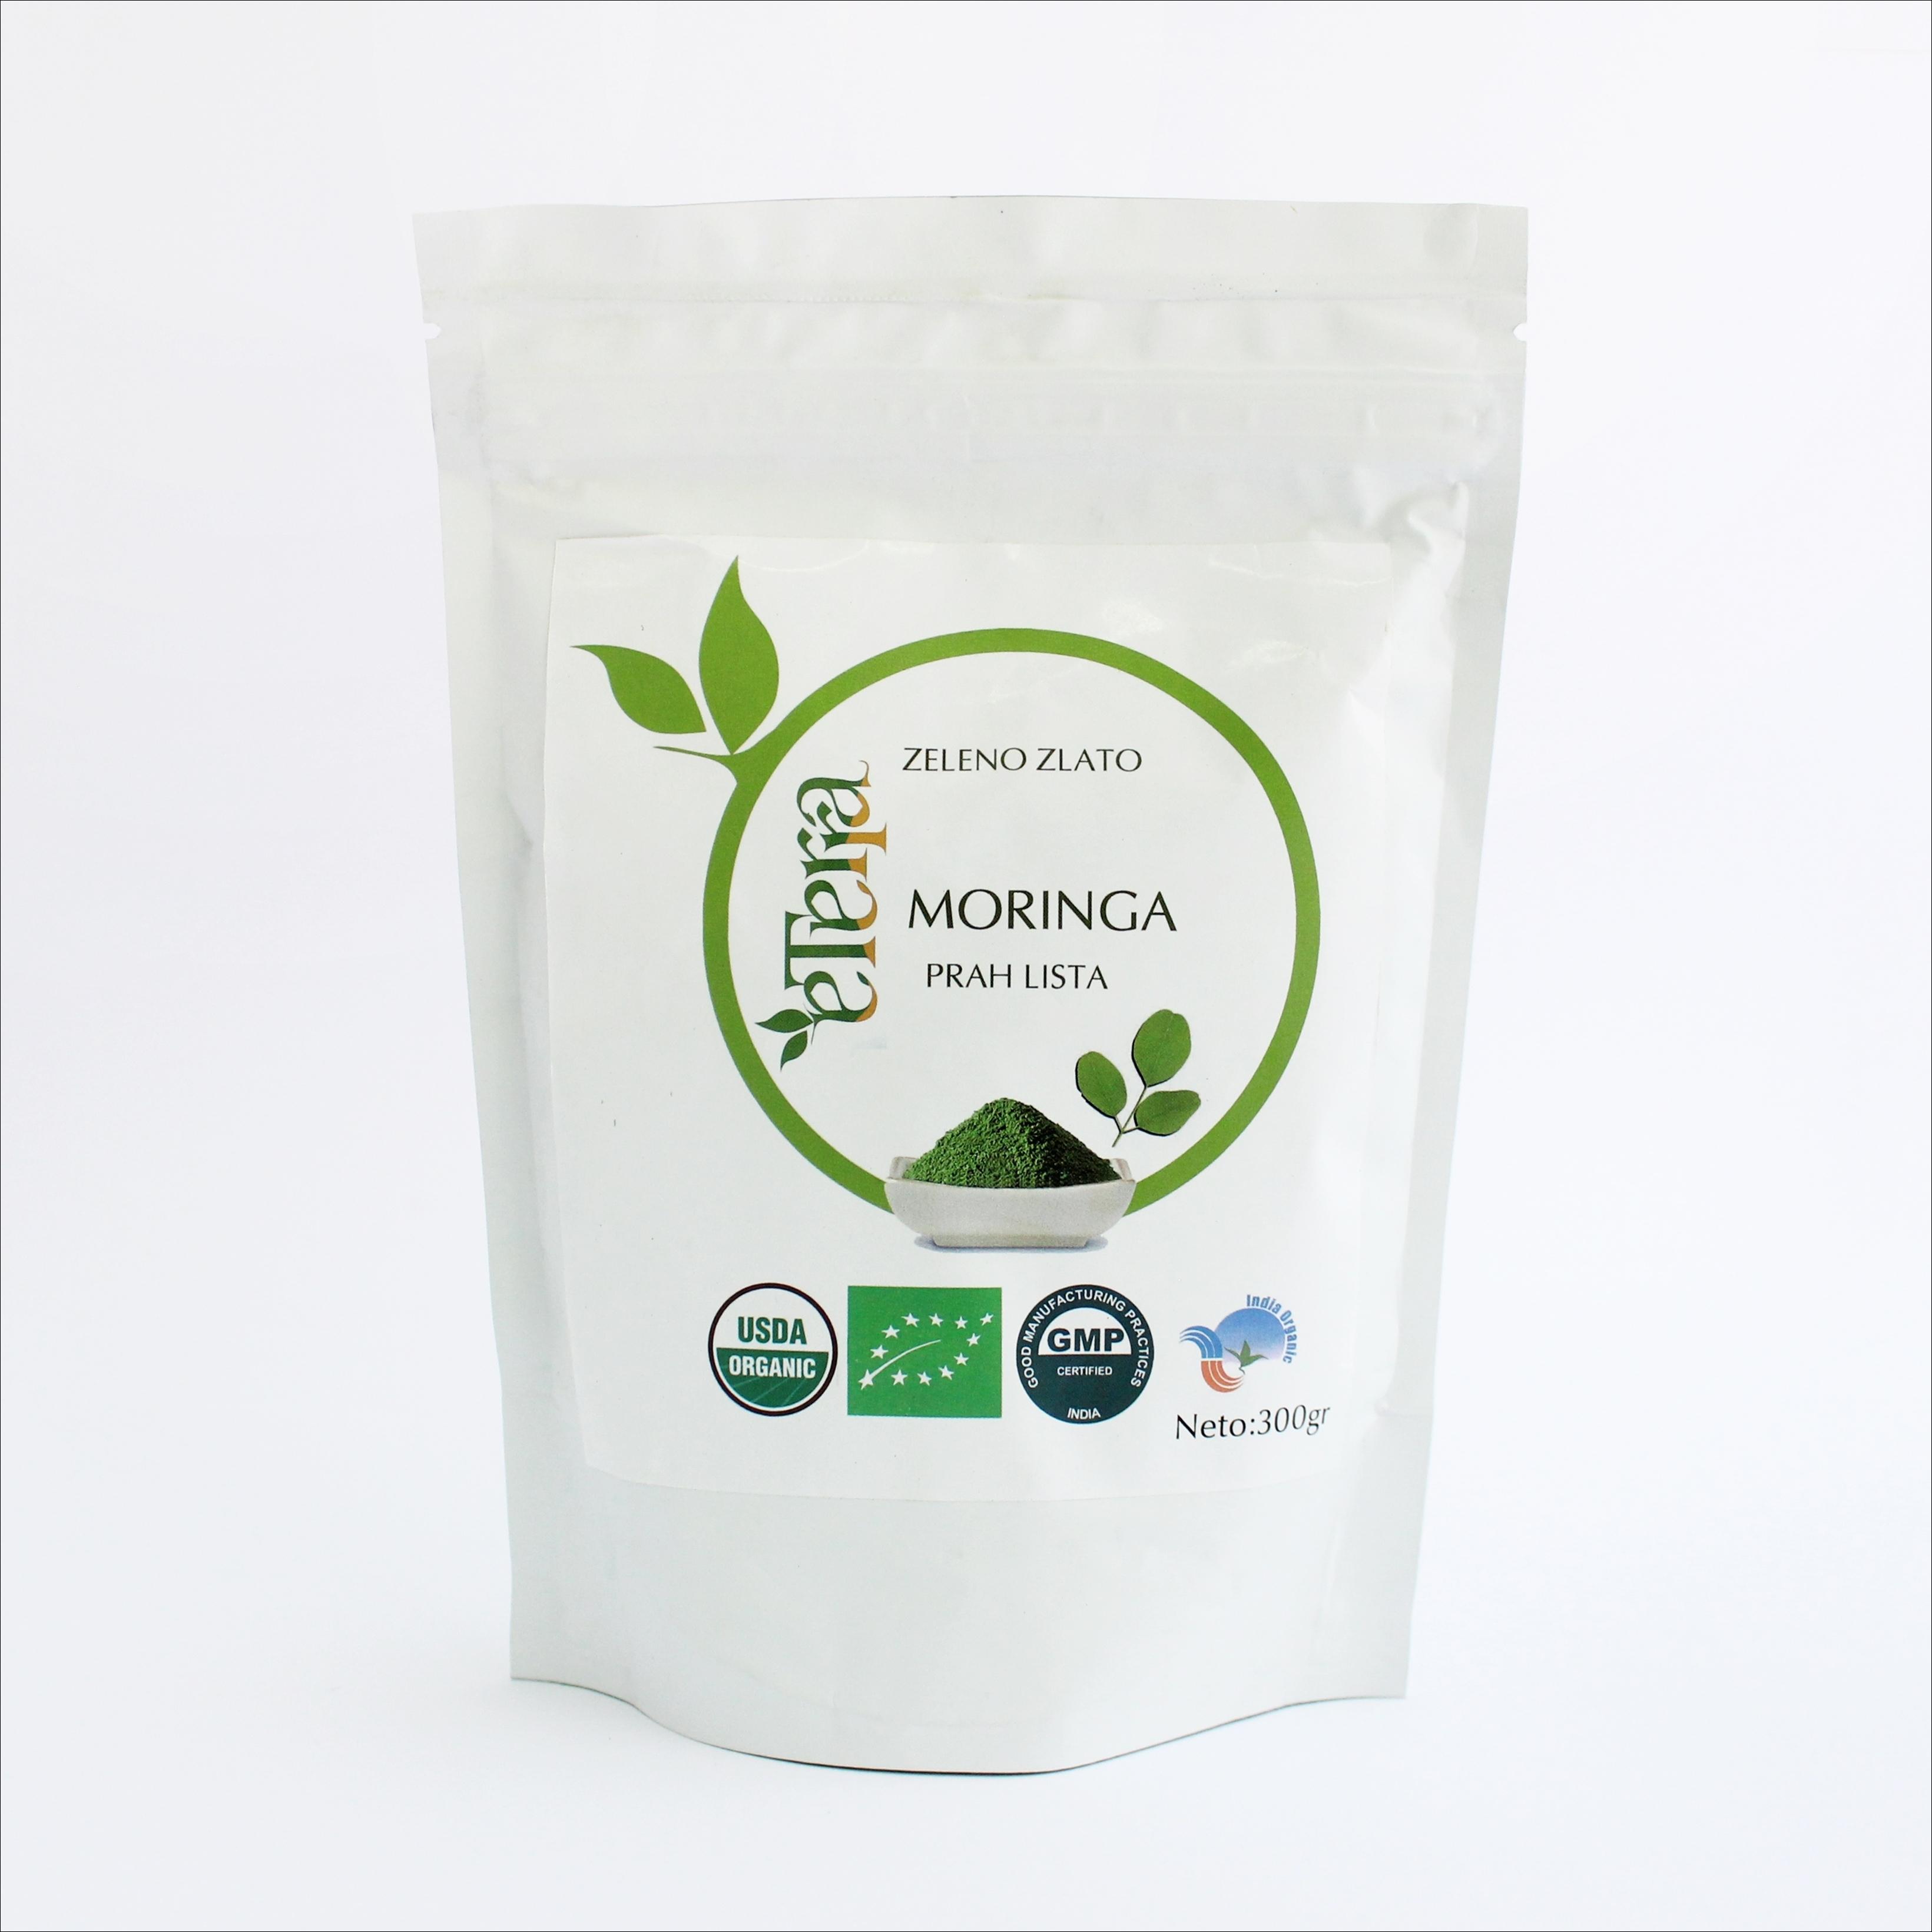 Eterra Moringa  Zeleno zlato 300 g (u prahu) 00015